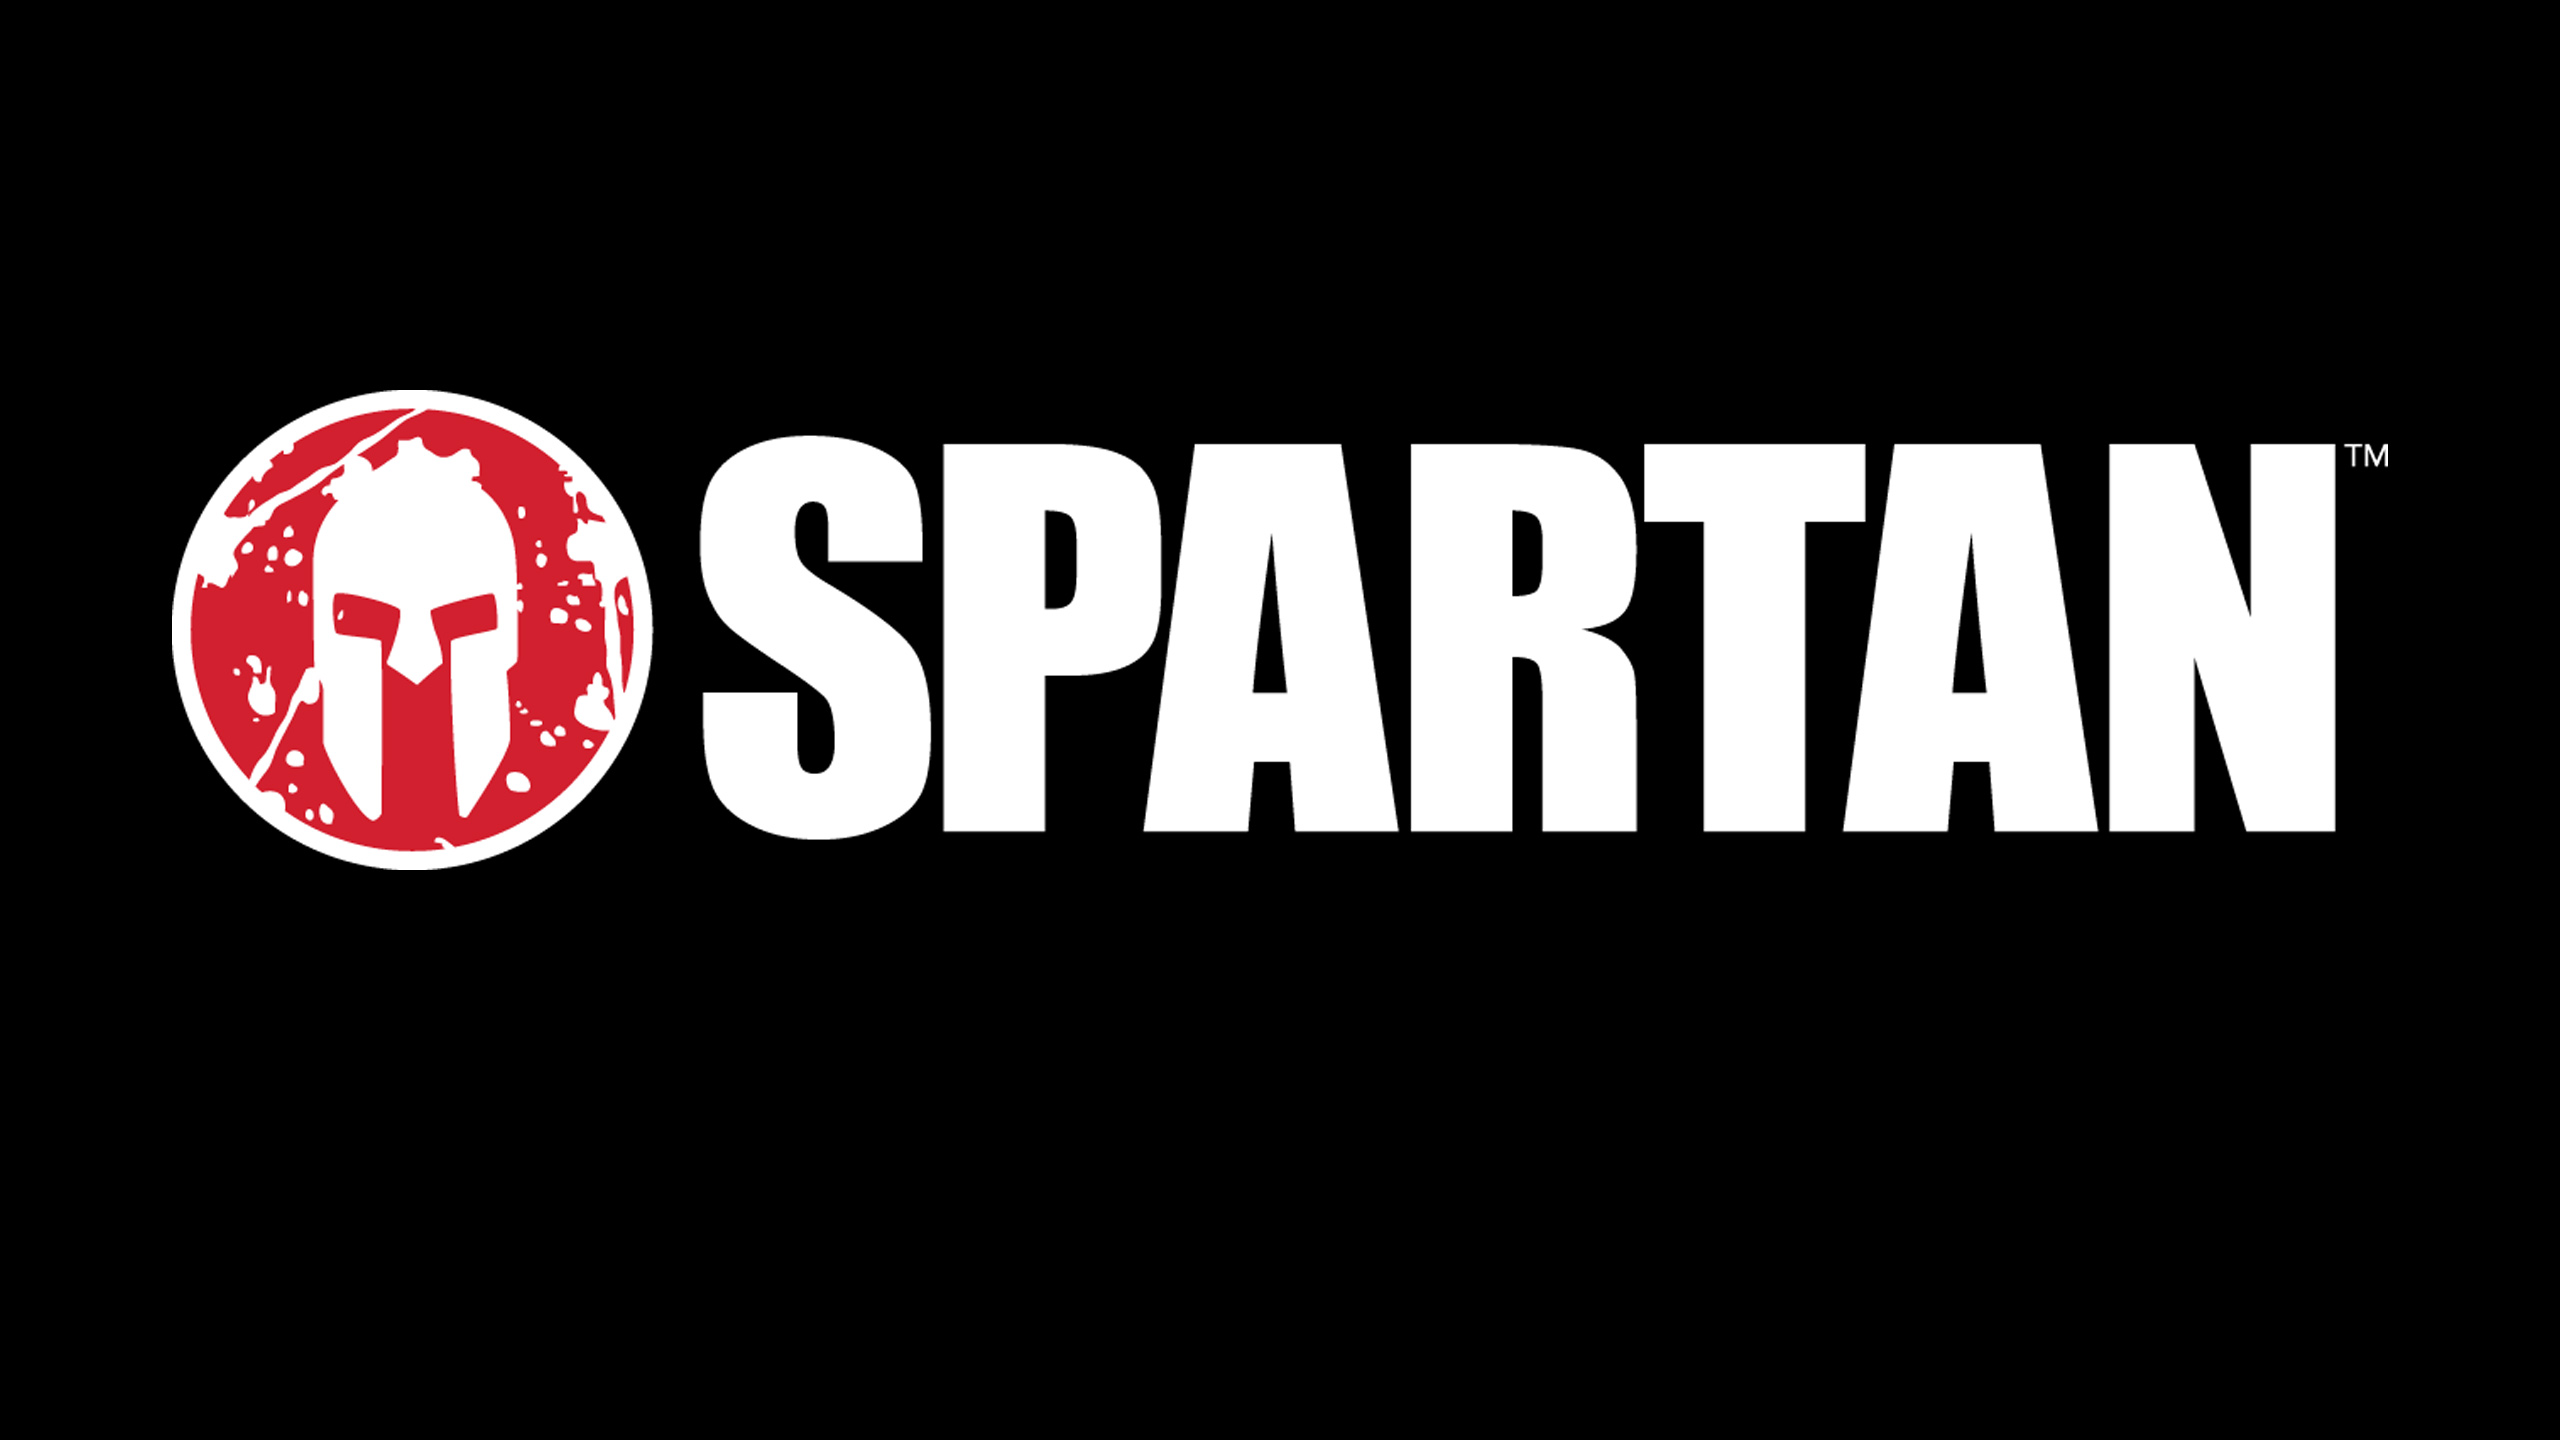 Spartan: The Championship Series